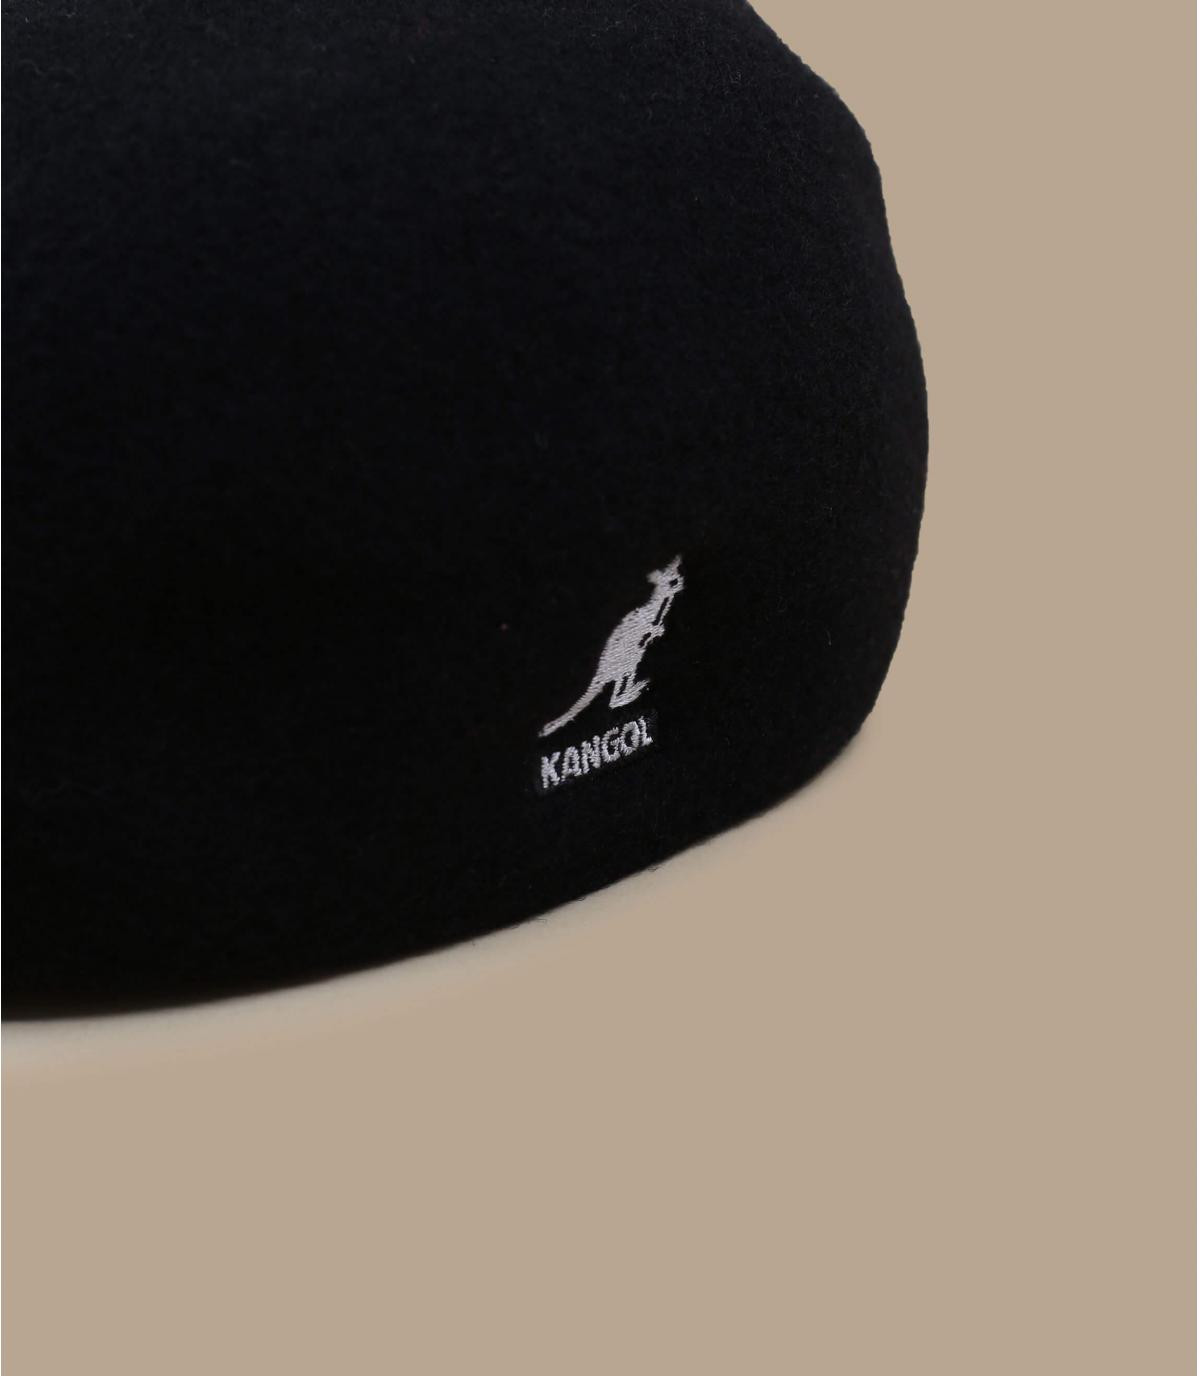 Détails 507 wool seamless black - image 2